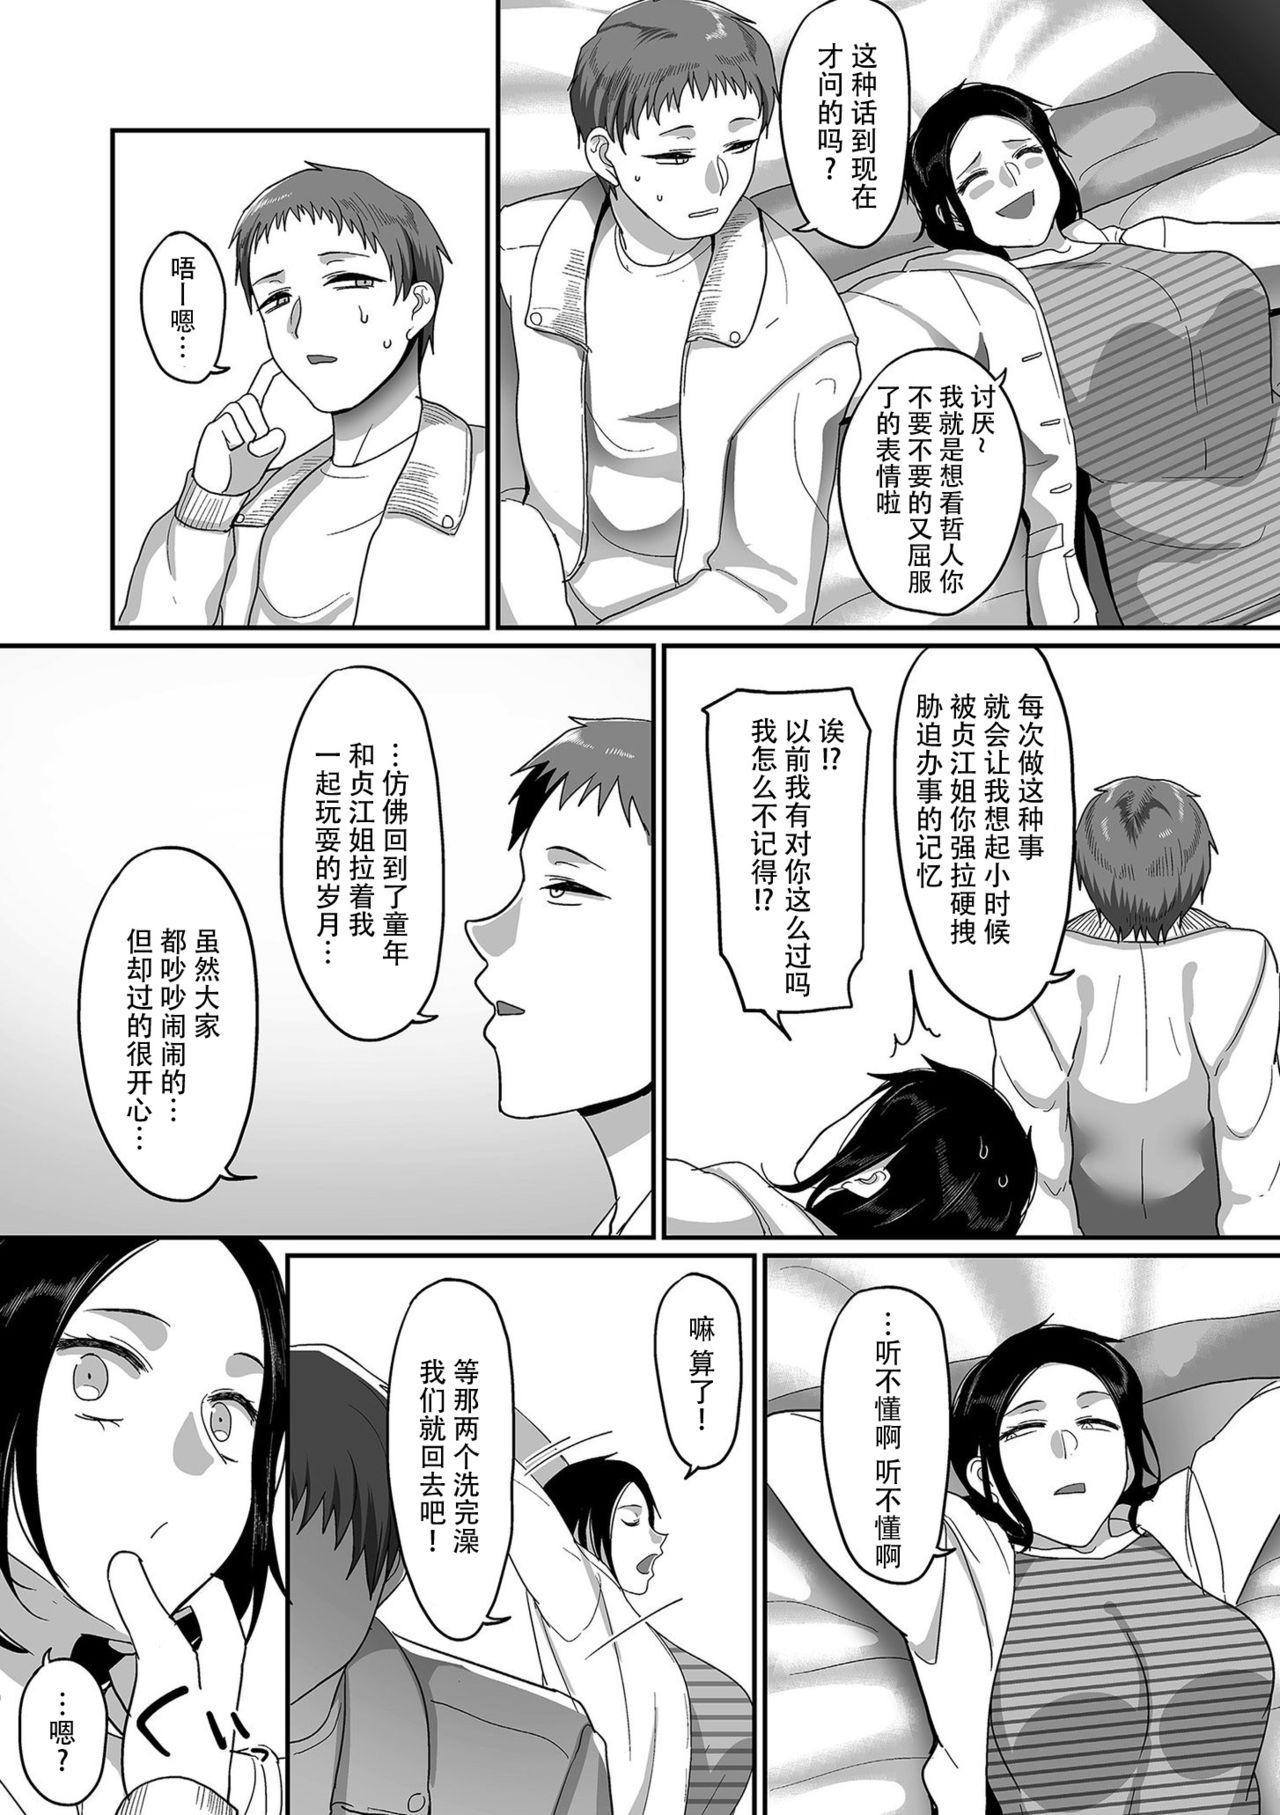 [Yamamoto Zenzen] S-ken K-shi Shakaijin Joshi Volleyball Circle no Jijou 4 | S县K市民间女子排球队的故事4 (COMIC KURiBERON DUMA 2020-03 Vol. 19) [Chinese] [listen to yourself×swordman联合汉化] 30